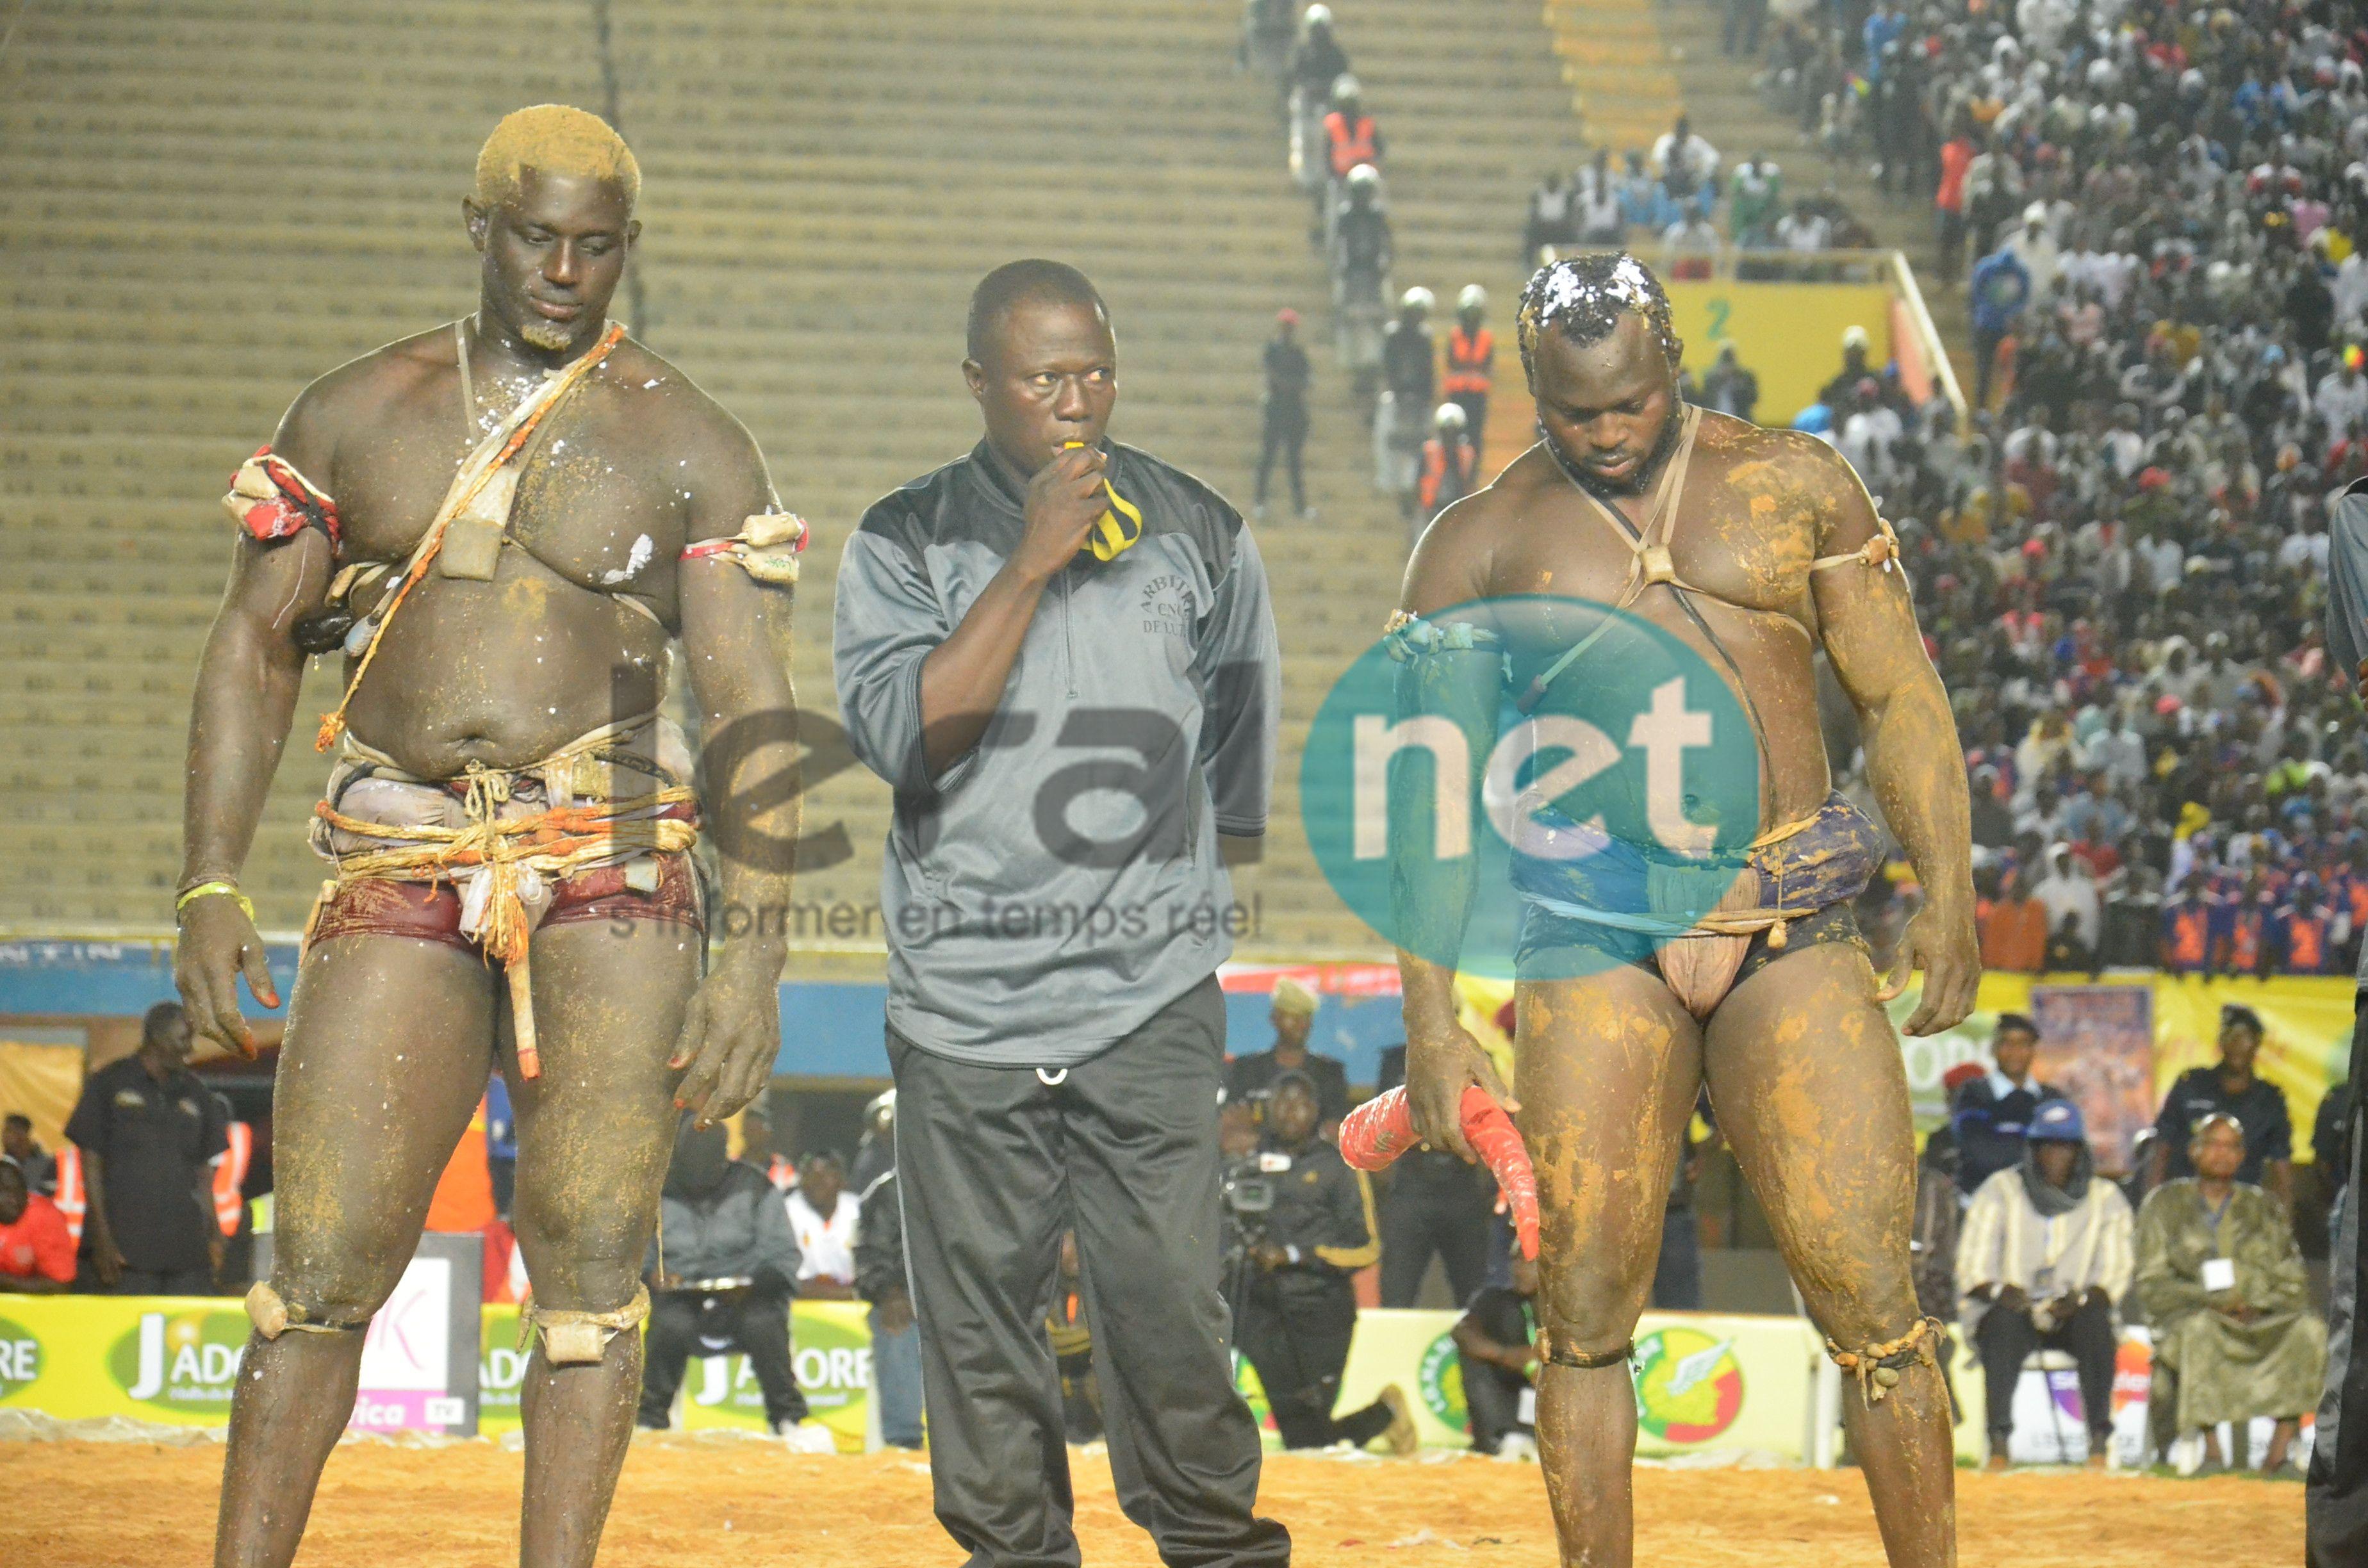 Les images du combat Modou Lo vs Balla Gaye 2 au Stade Léopold Sedar Senghor